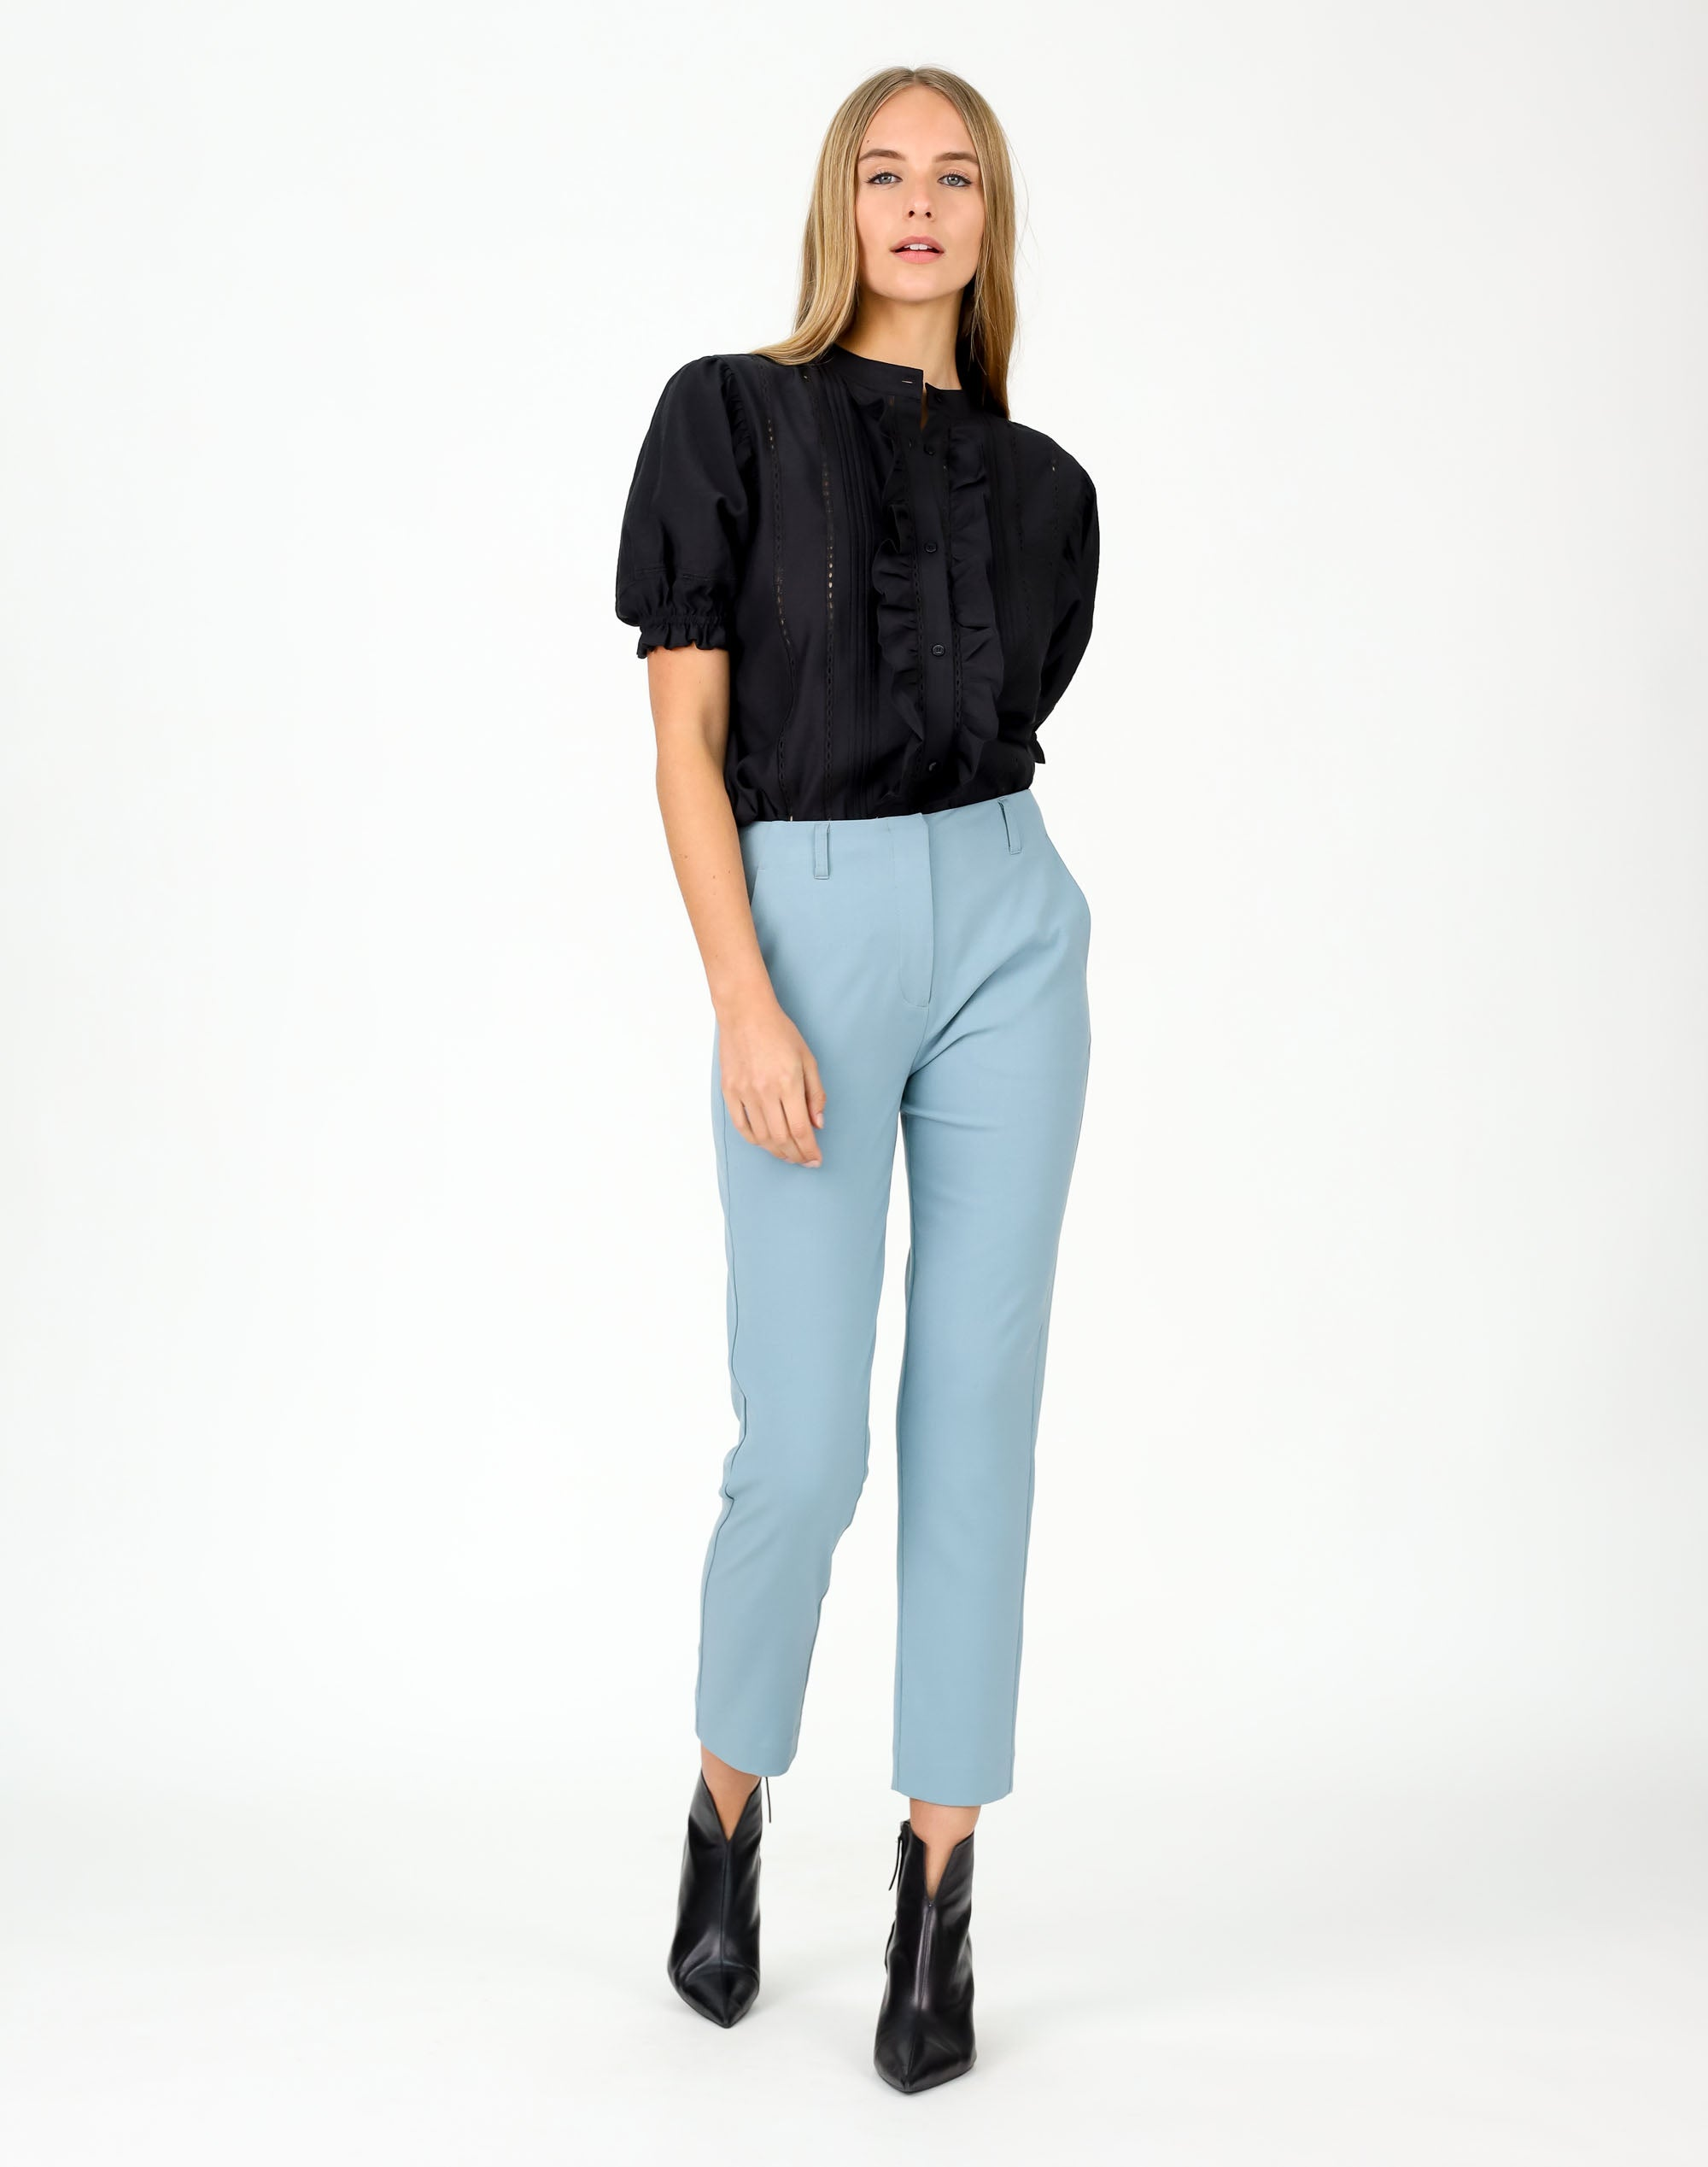 Lace Detail Shirt